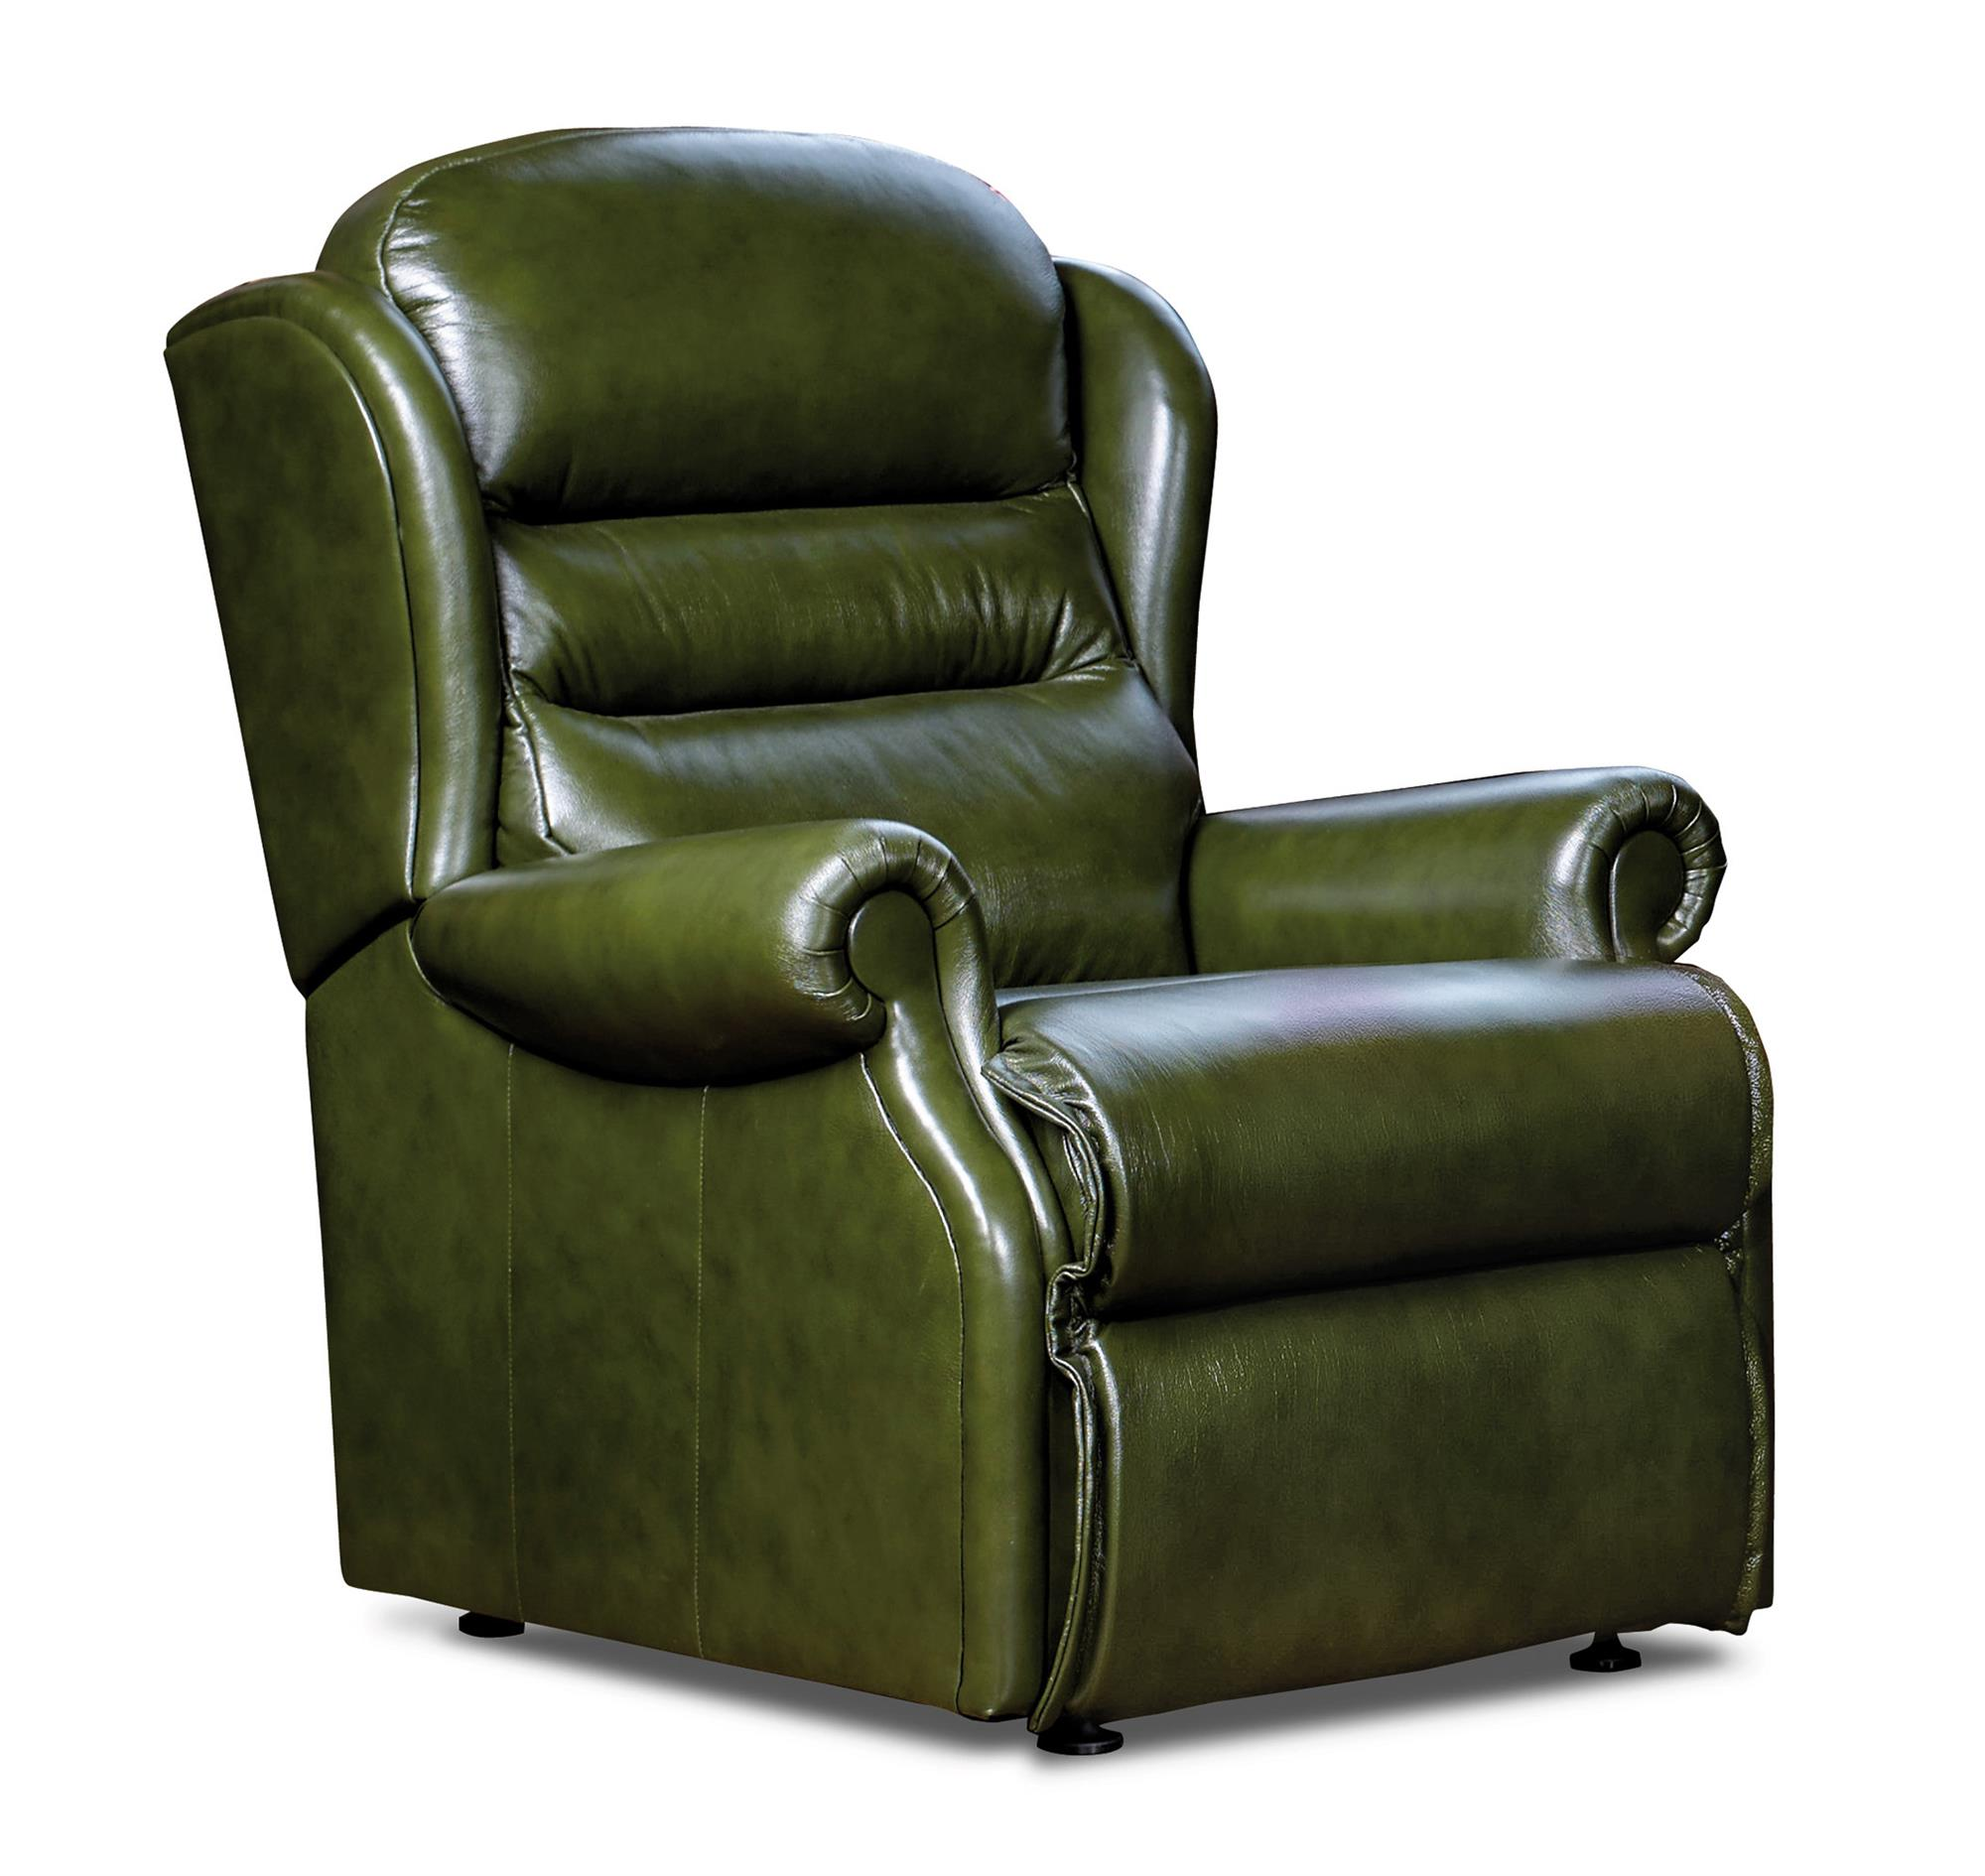 ASHFORD - Leather Fixed Chair